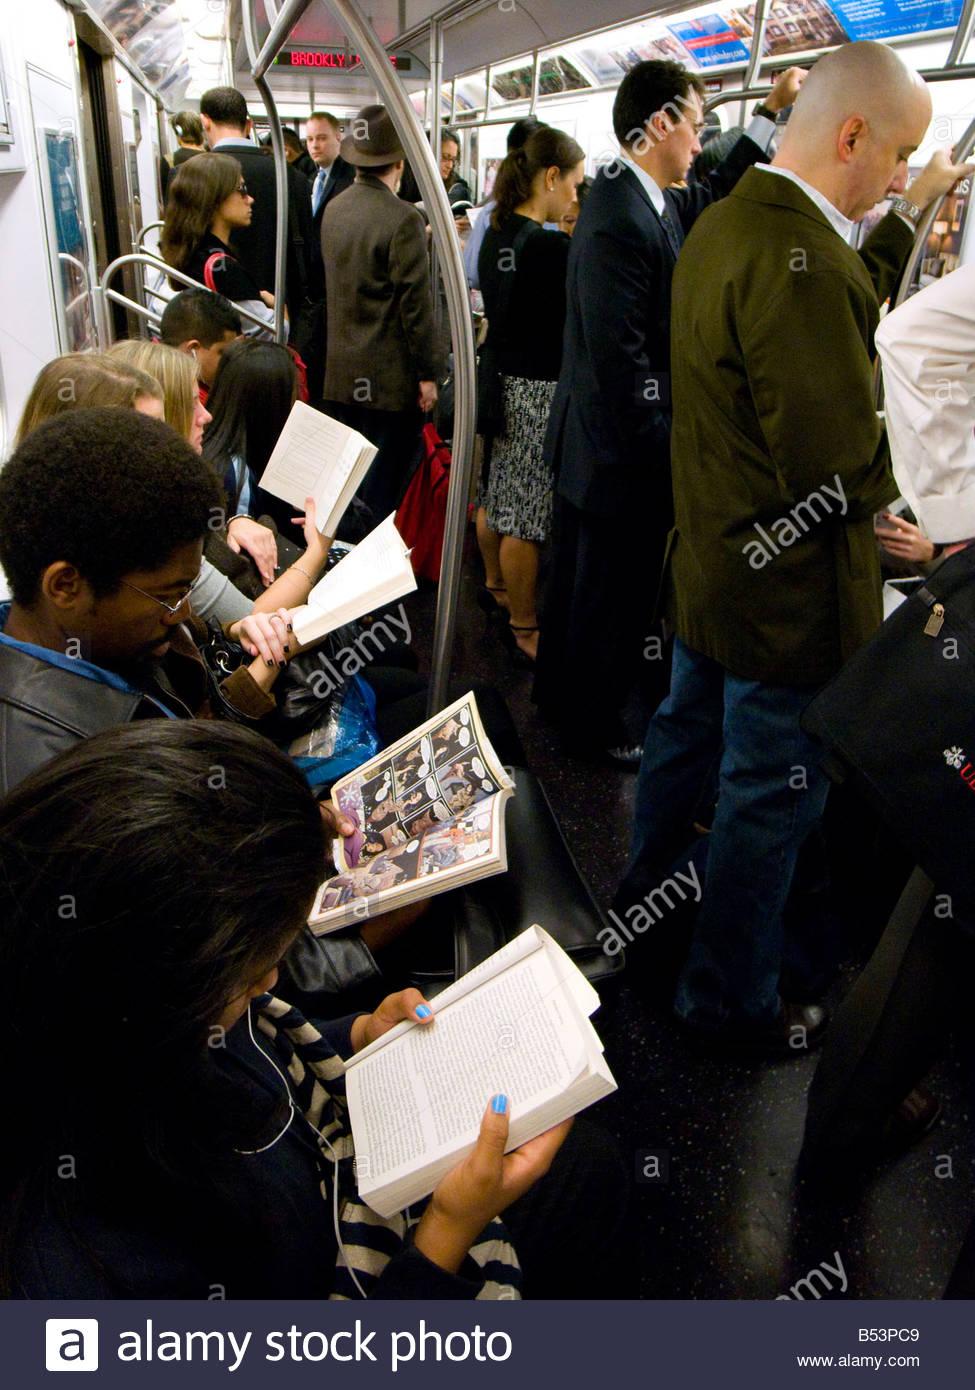 Passengers reading  on New York Subway train - Stock Image